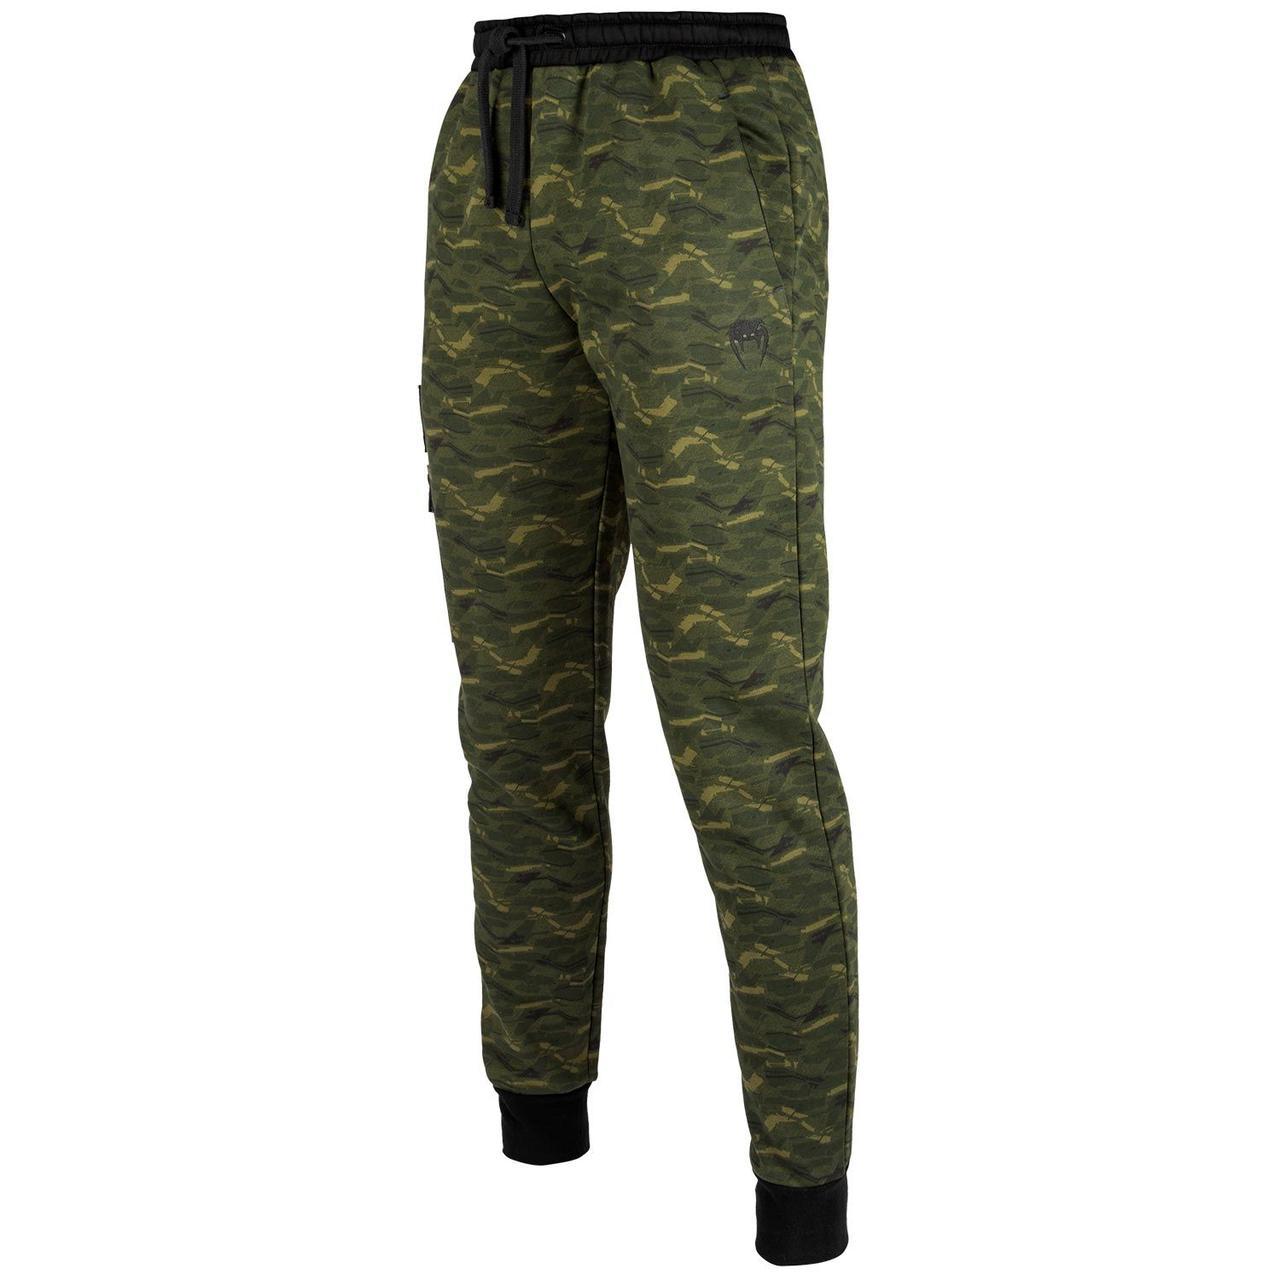 Спортивные штаны Venum Tramo 2.0 Pants Khaki